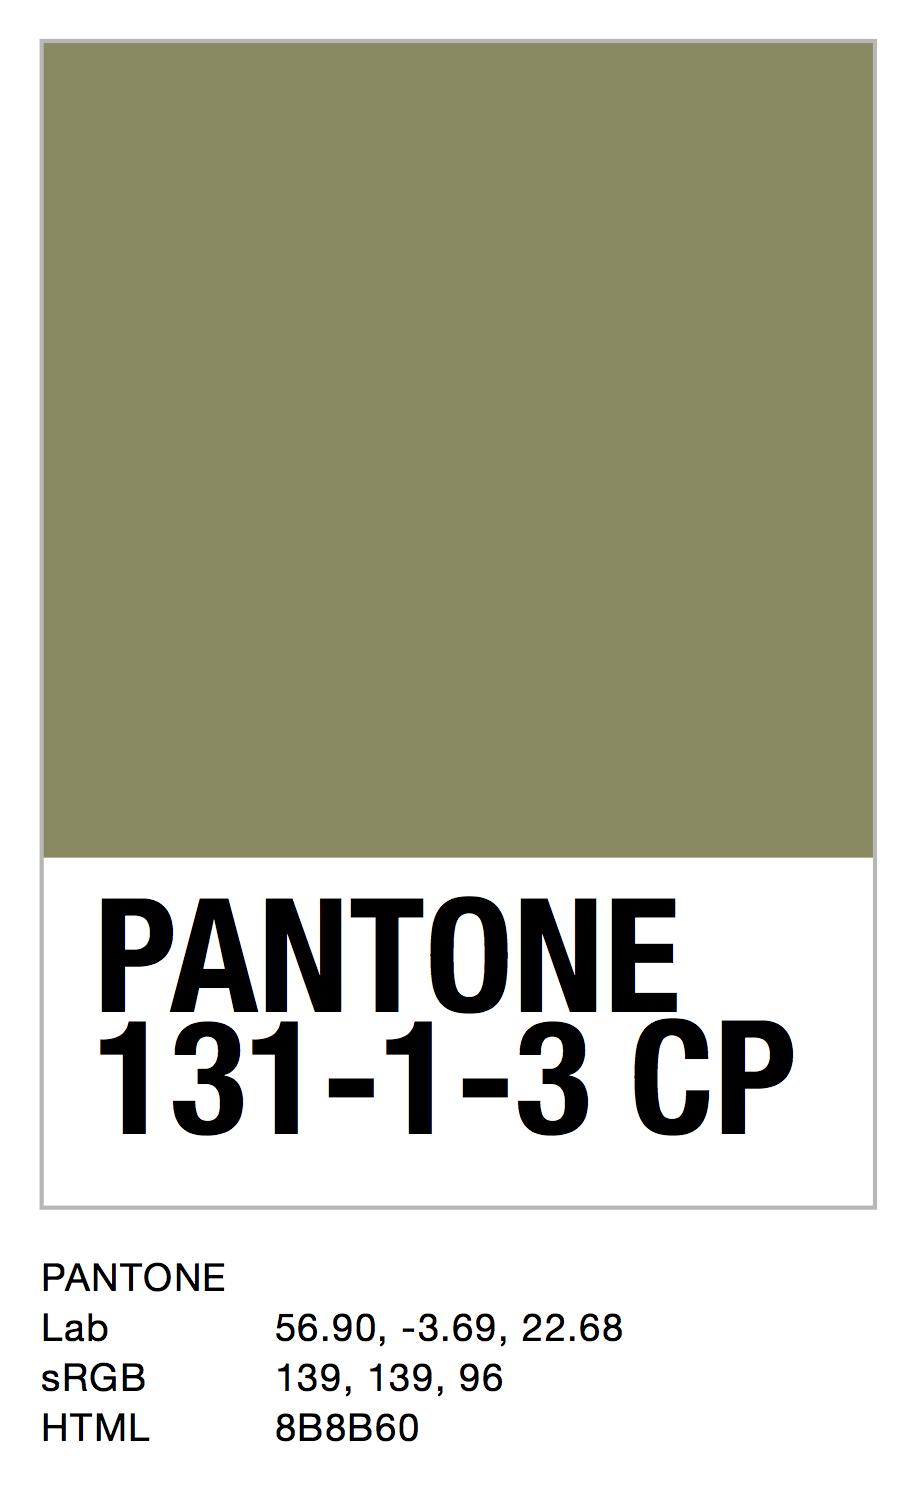 PANTONE 131-1-3 CP.jpg